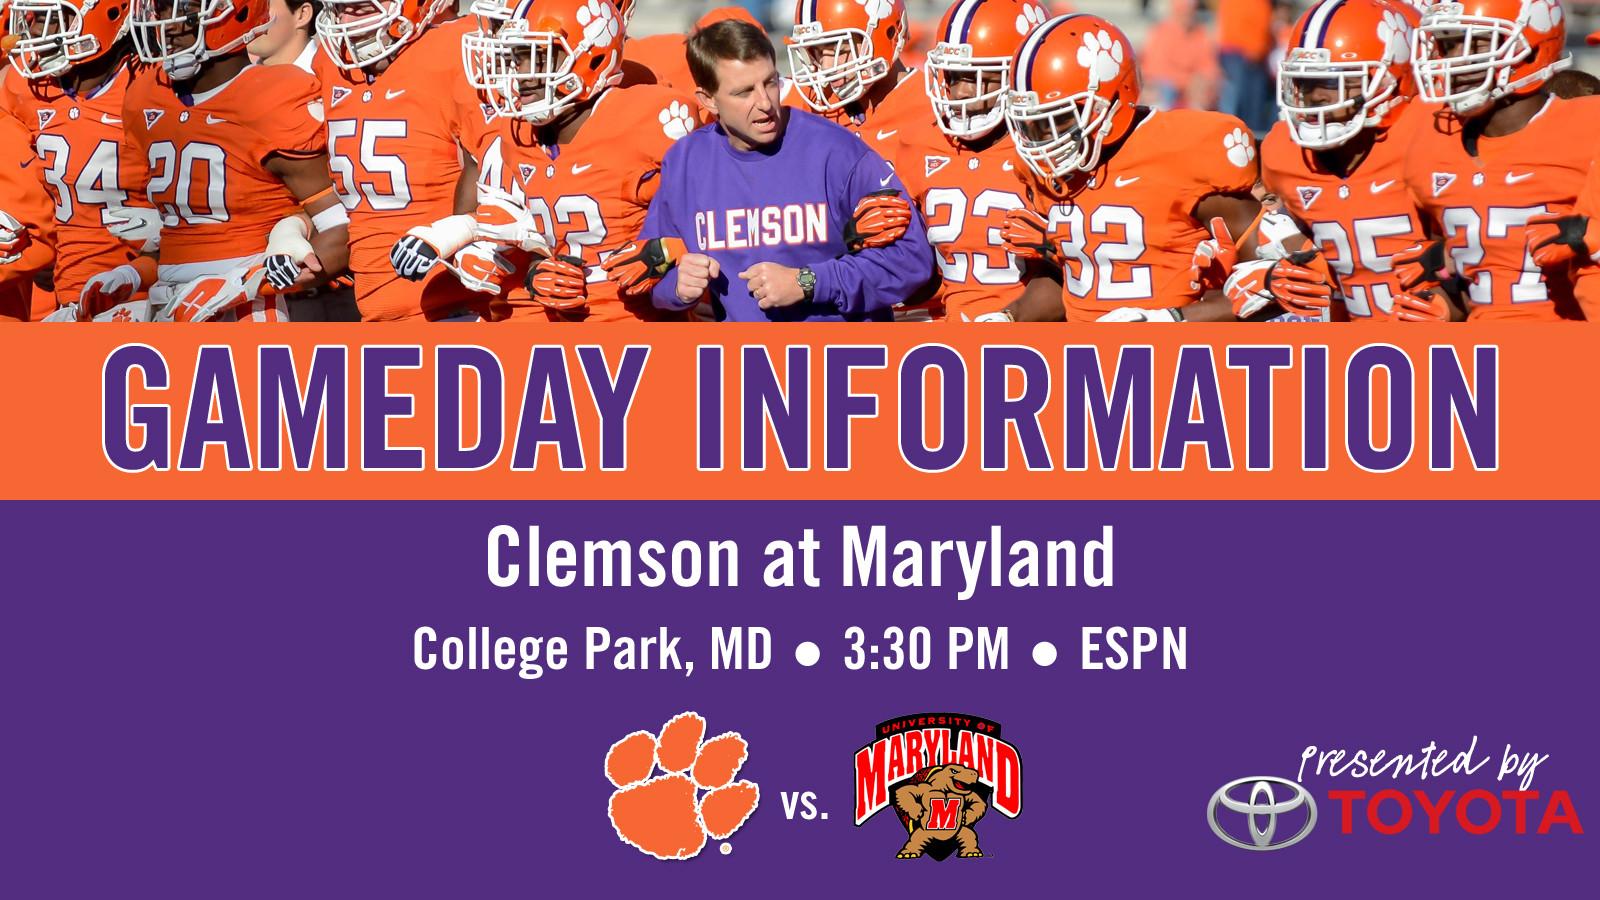 Clemson @ Maryland Football Gameday Information